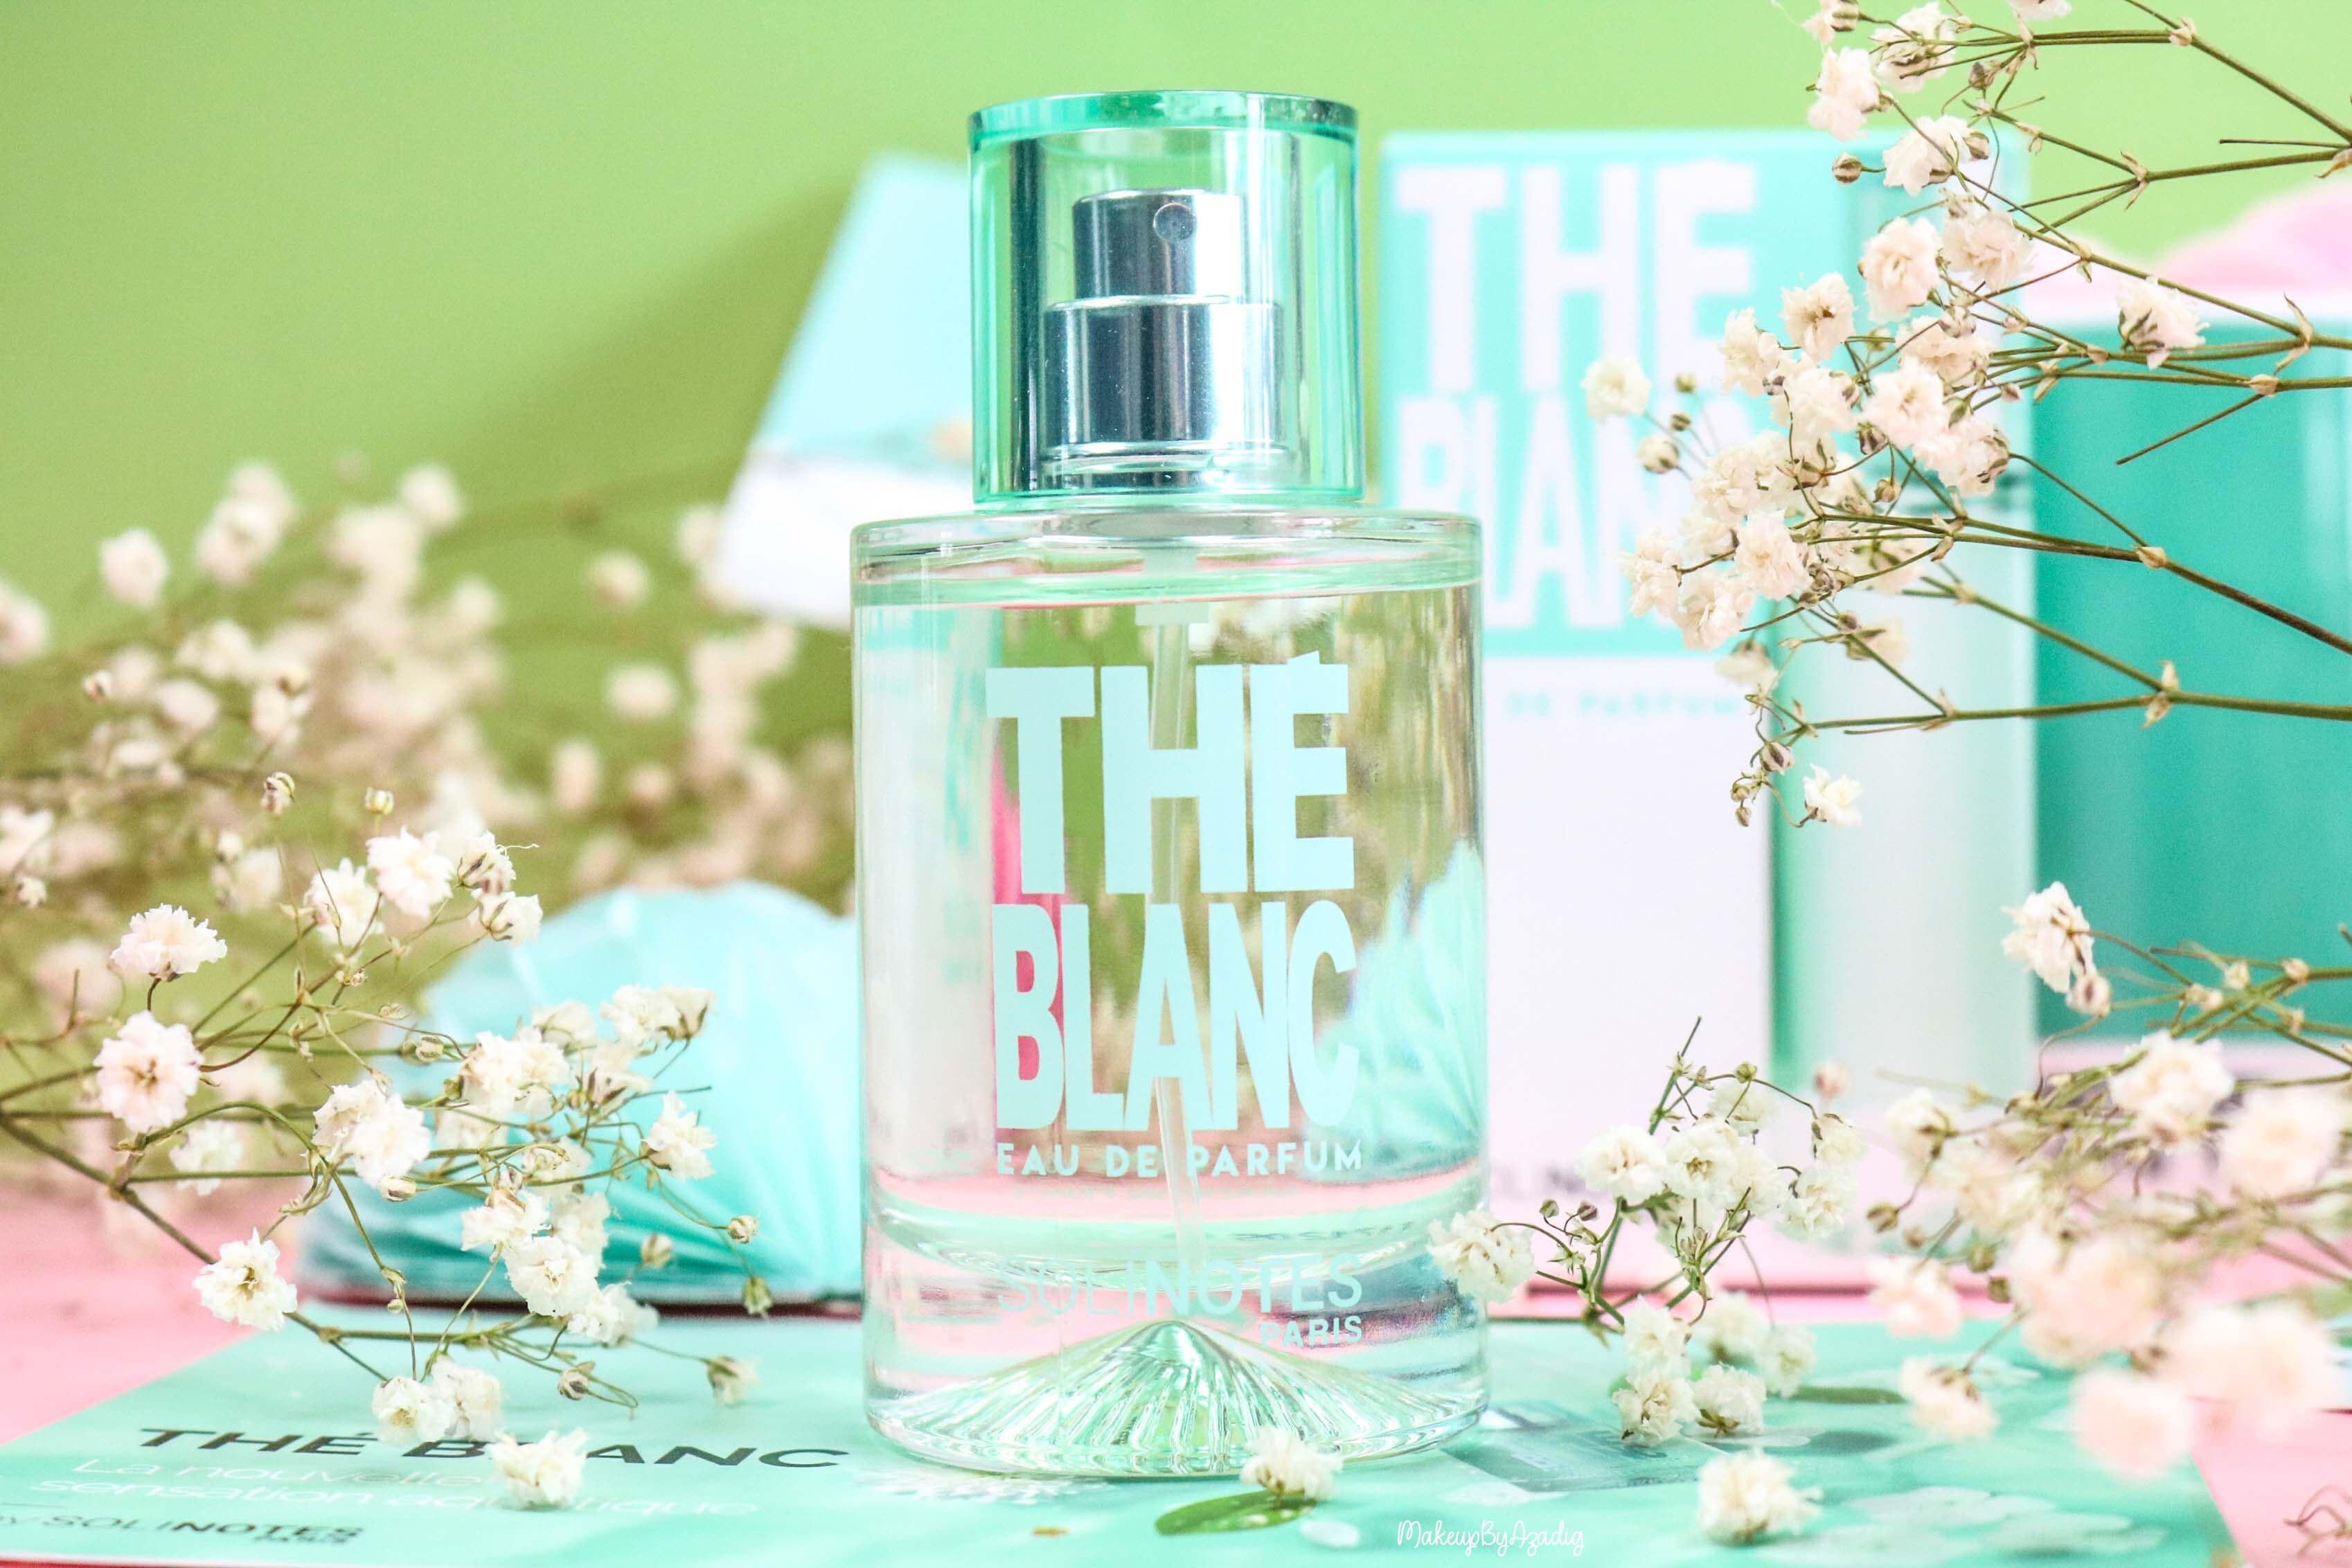 revue-parfum-solinotes-sephora-monoprix-the-blanc-vanille-oranger-prix-pas-cher-promo-makeupbyazadig-fragrance